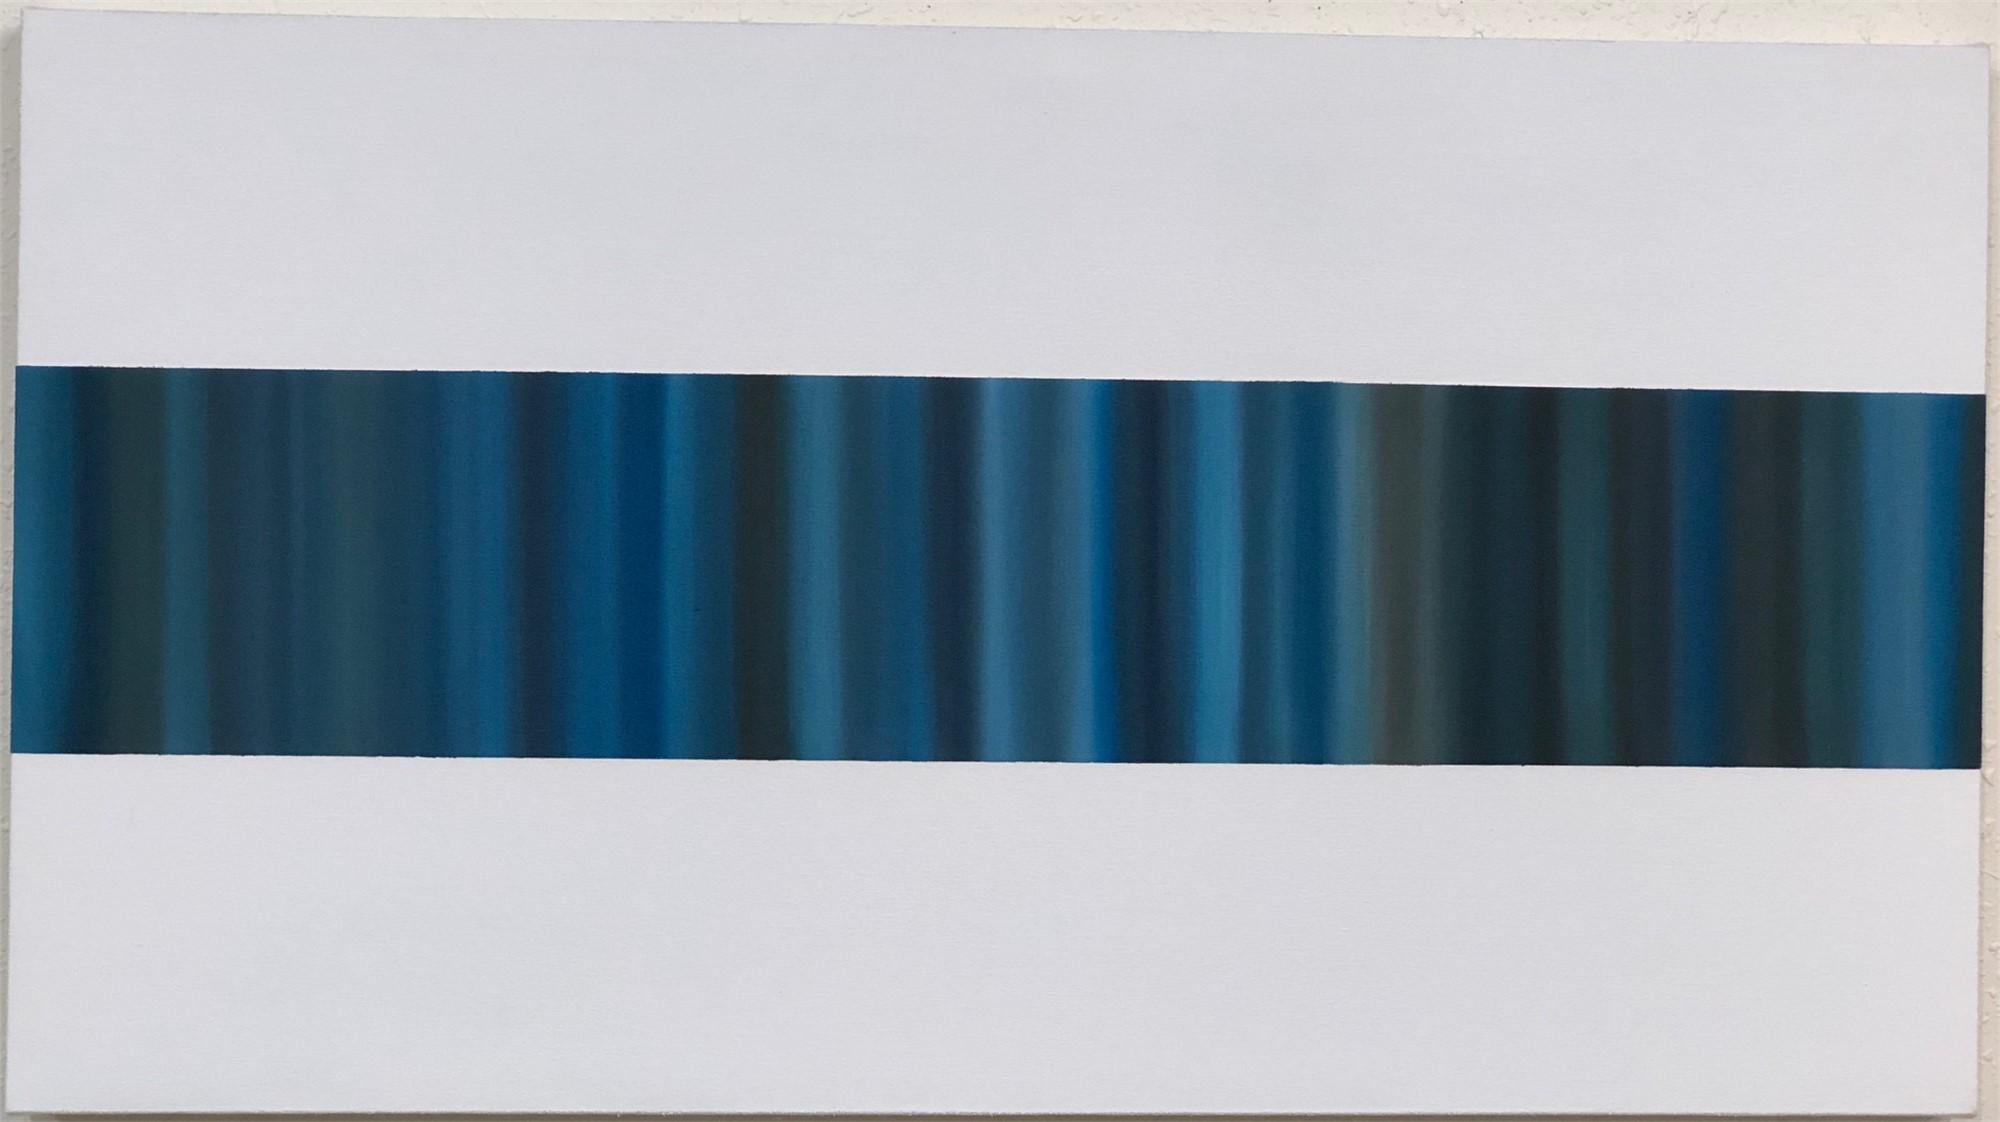 Windows III by Louis Vega Trevino